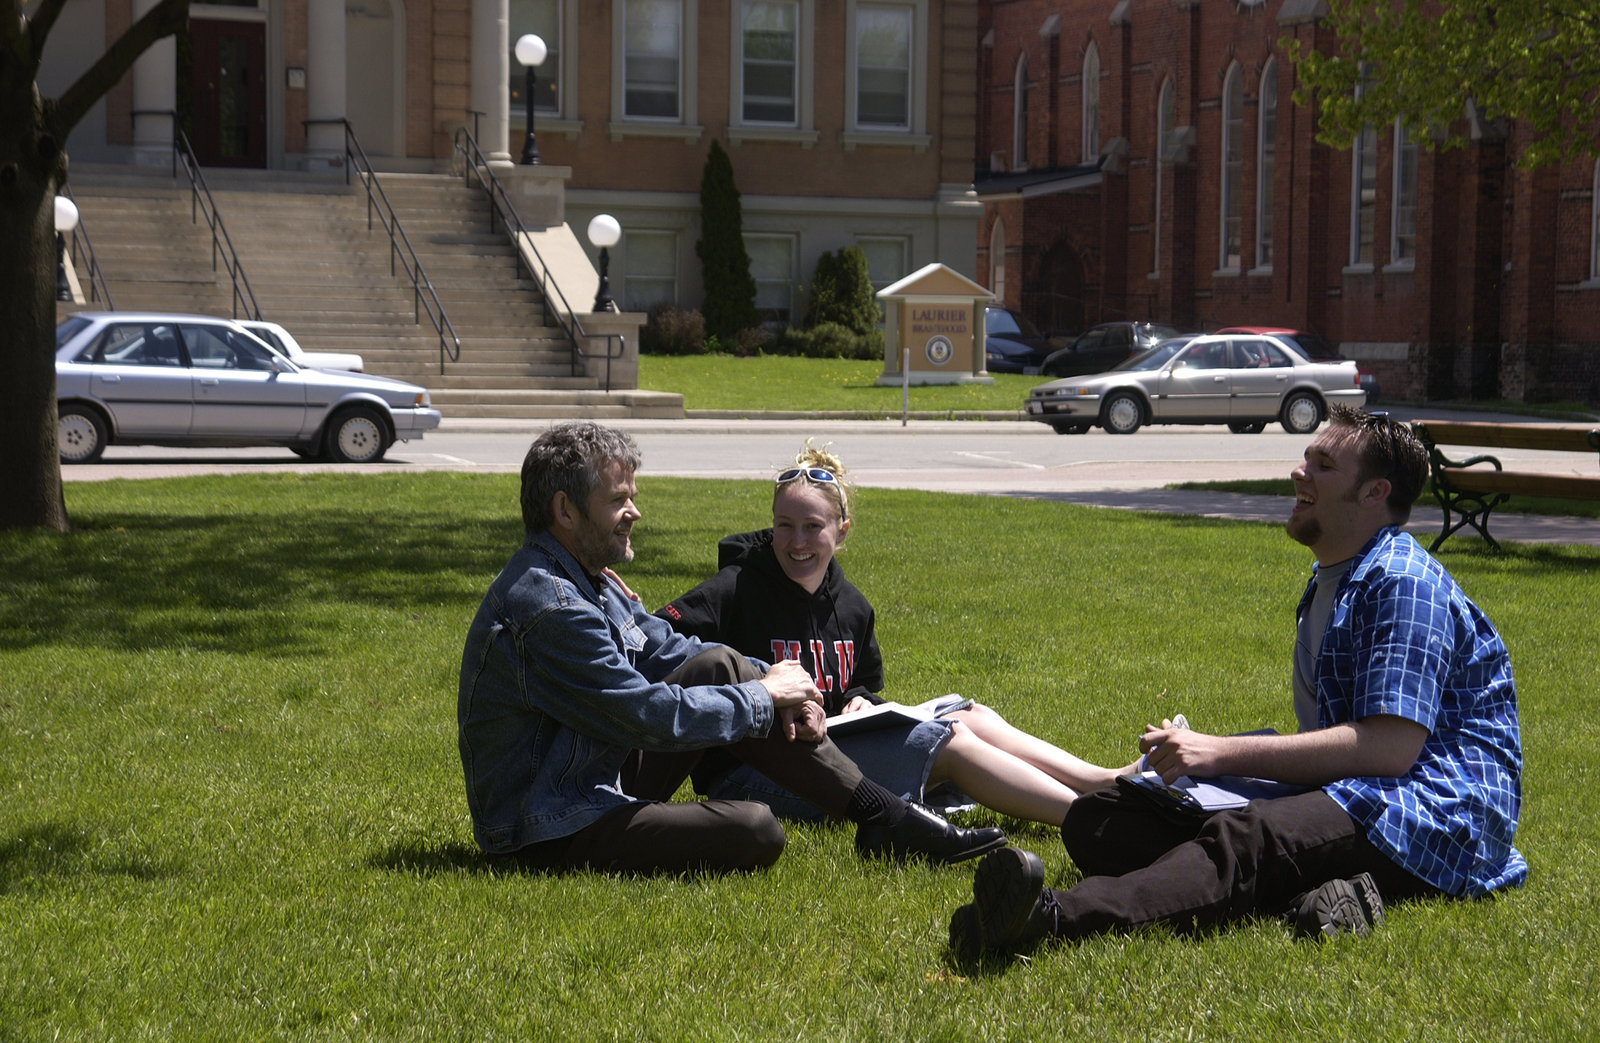 Leo Groarke and students in Victoria Park, Brantford, Ontario